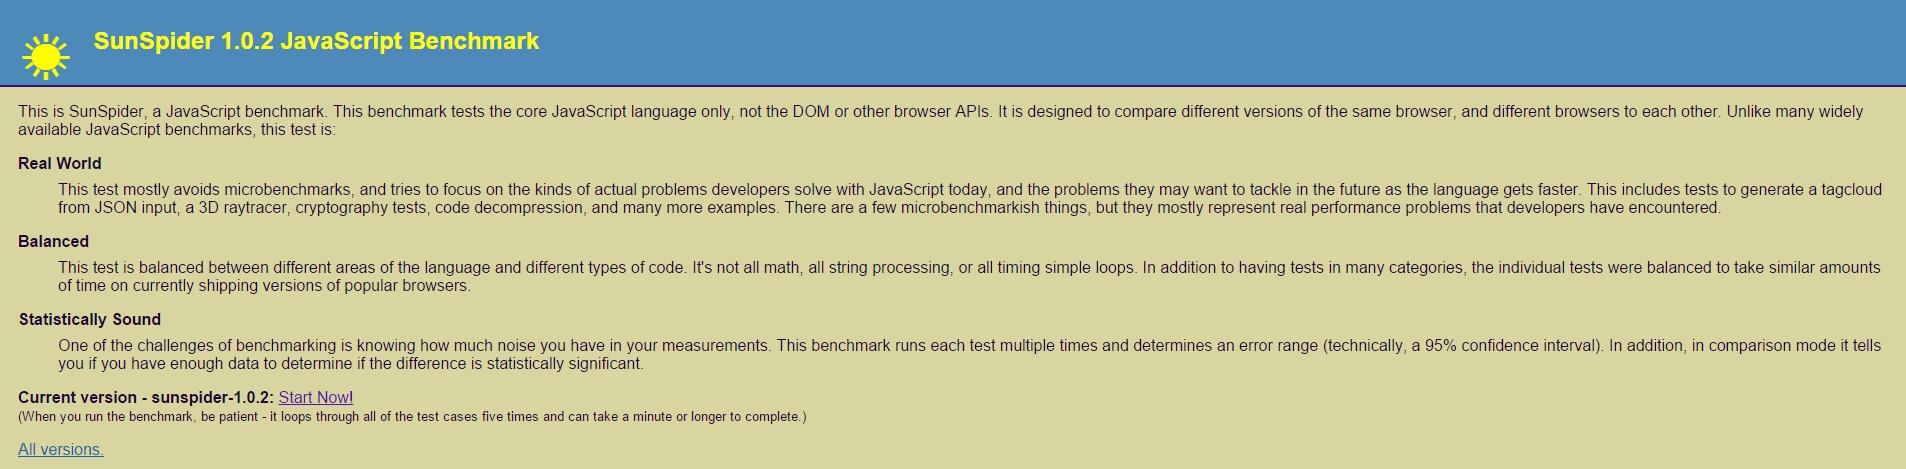 SunSpider-JavaScript-Benchmark